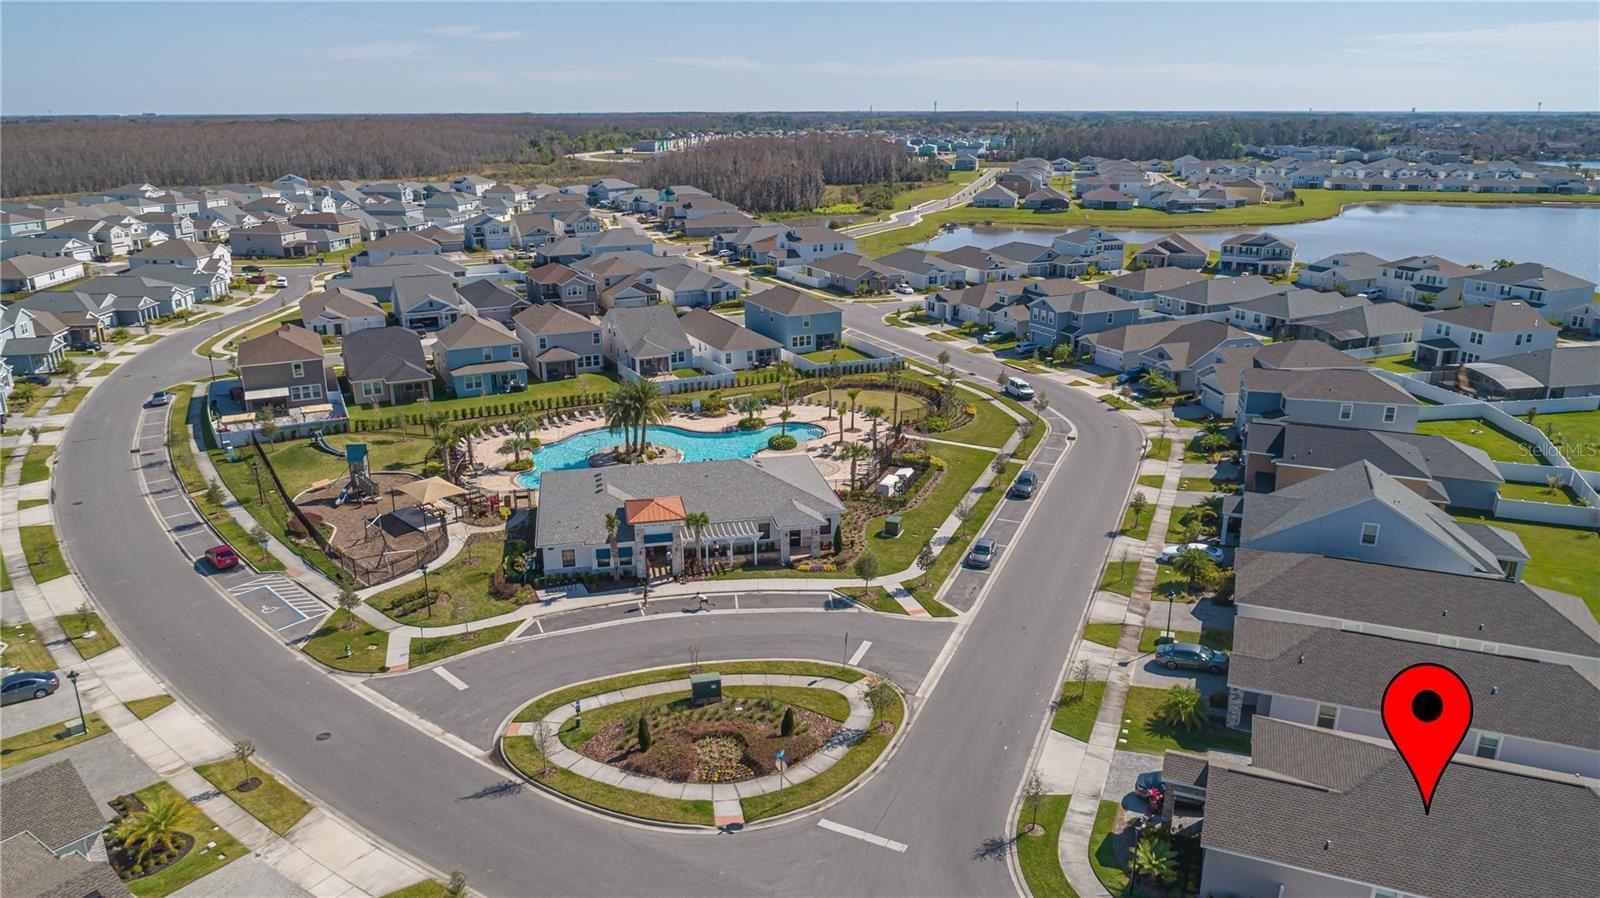 Photo of 3098 PRELUDE LANE, KISSIMMEE, FL 34746 (MLS # S5056836)